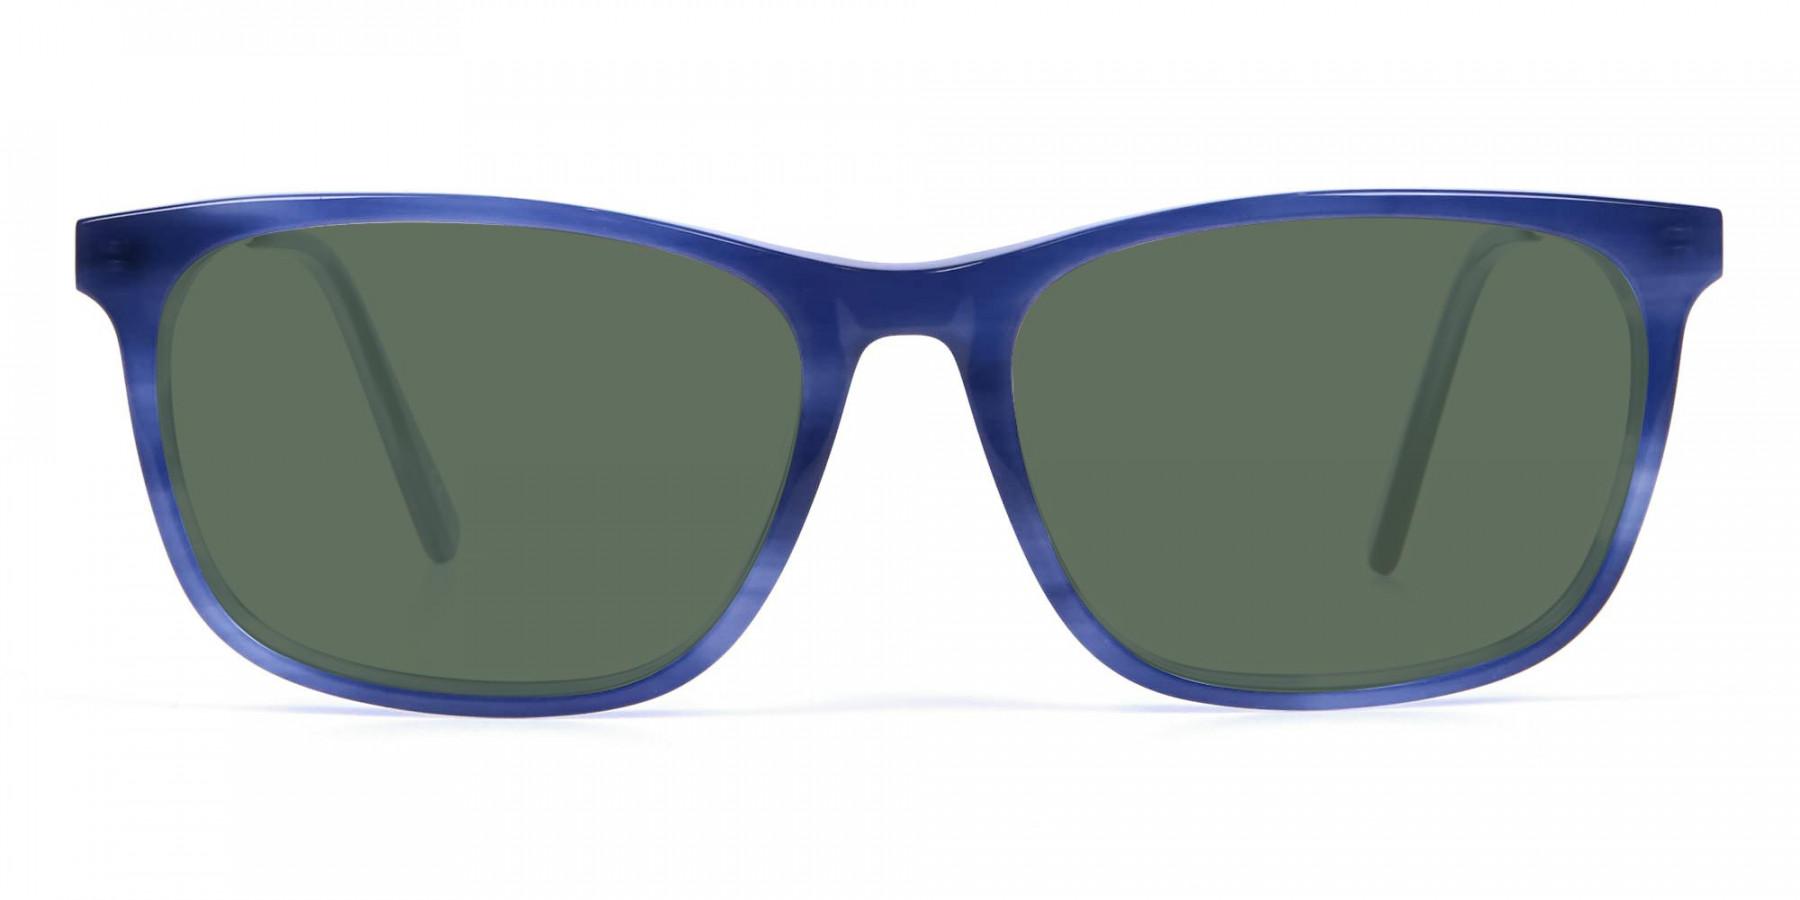 Dark Green Tinted Sunglasses - 3